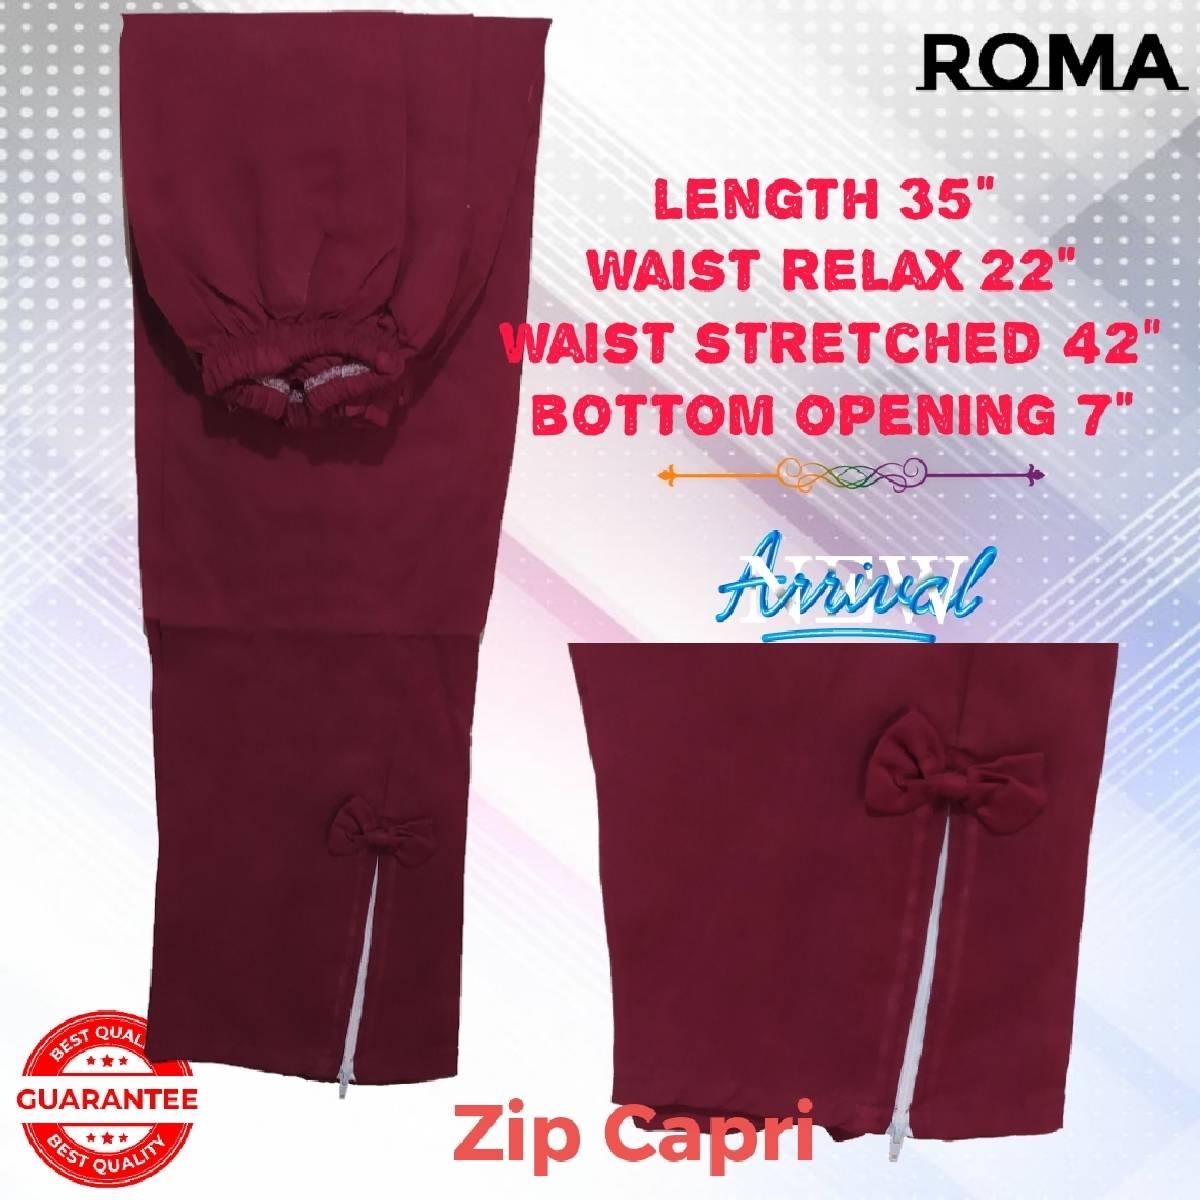 ROMA Store Cotton Zip Capri for Women